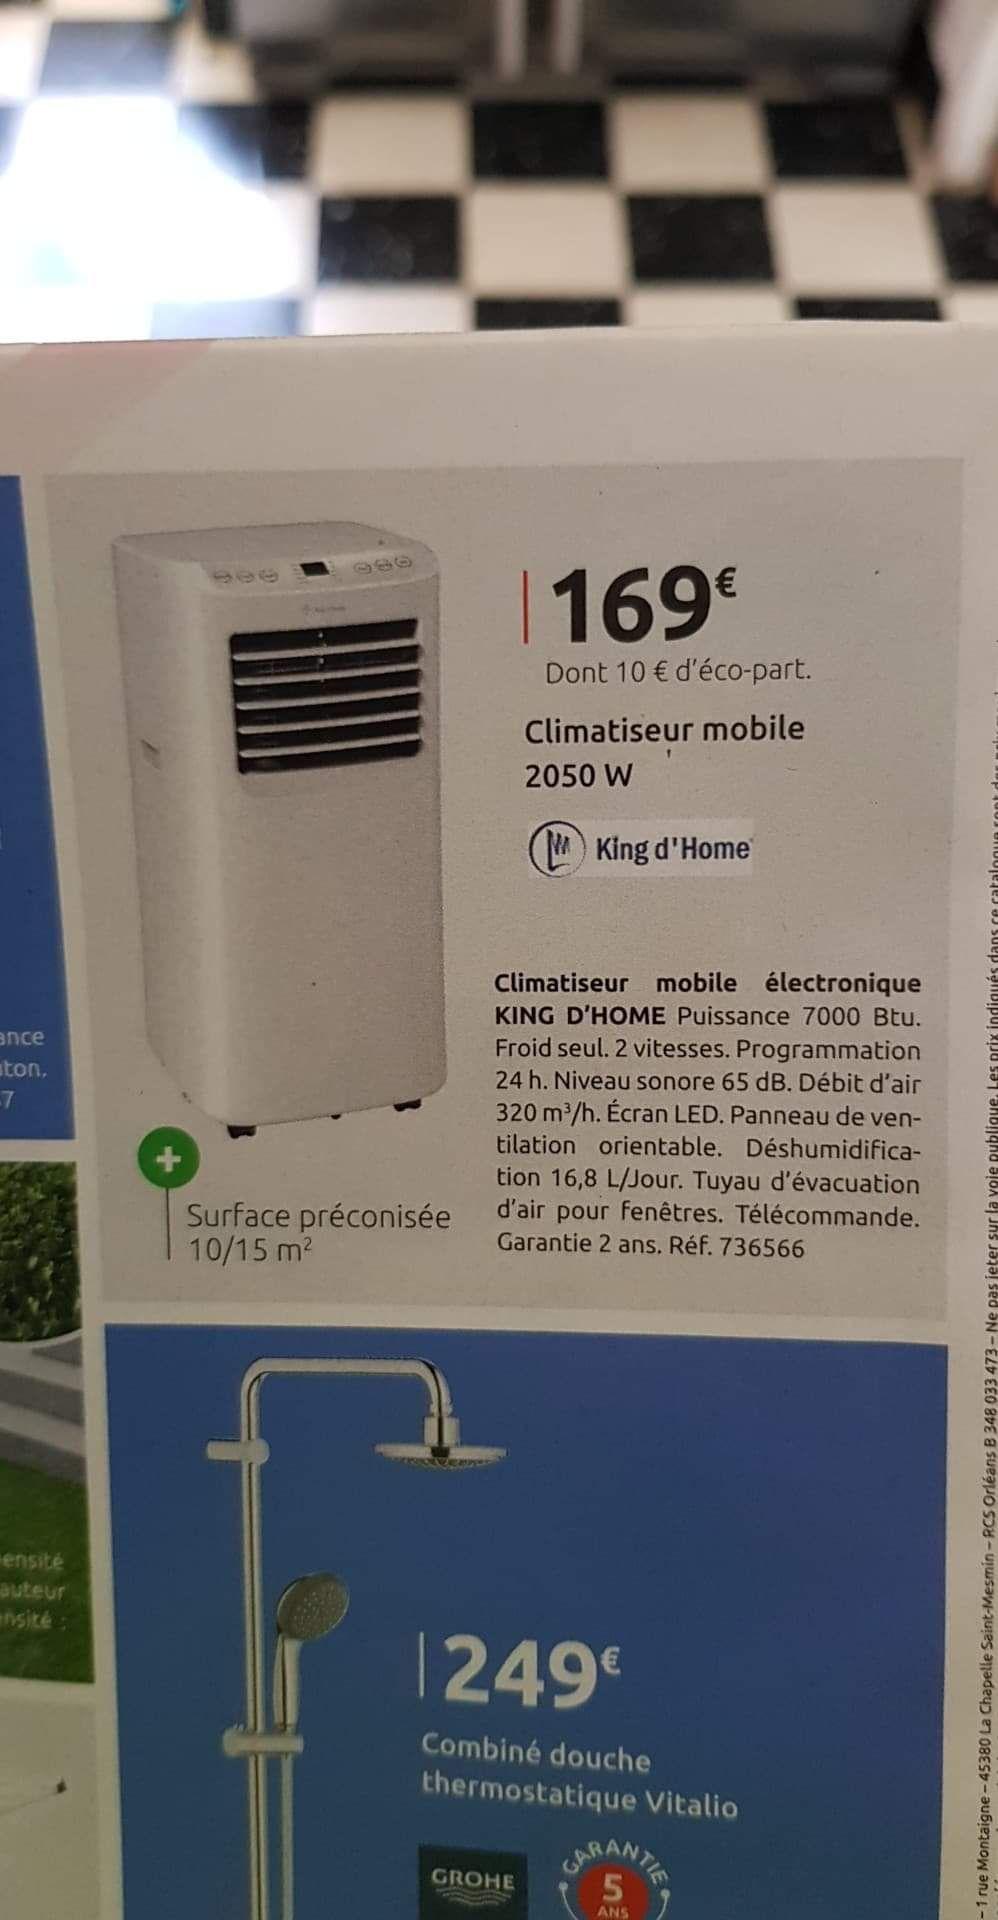 Climatiseur mobile King d'Home - 7000 Btu, 2050 W